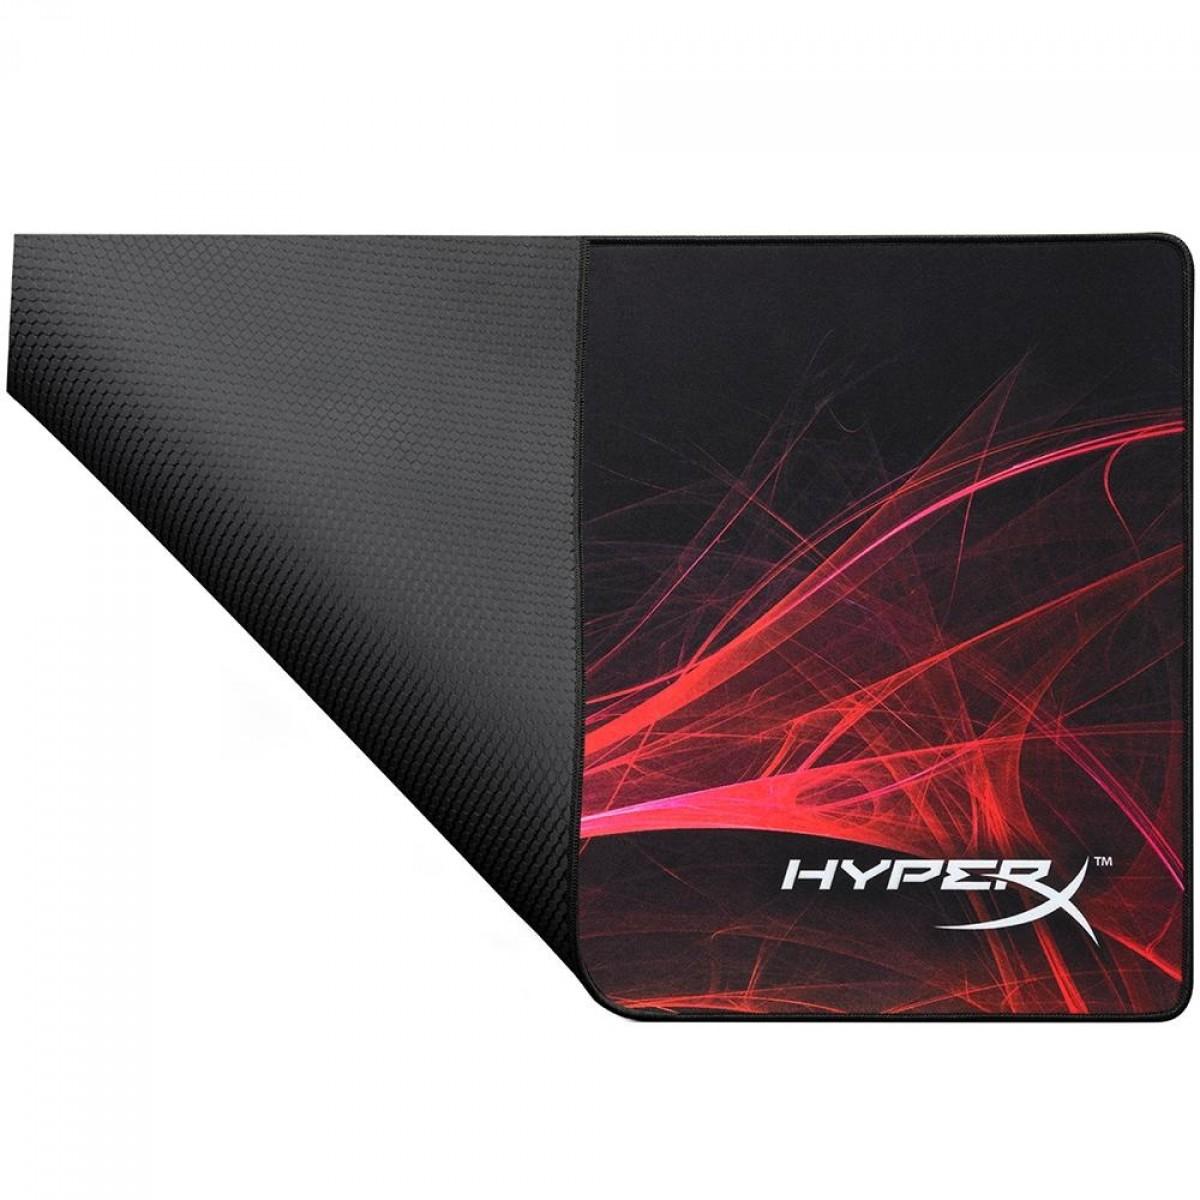 Mousepad Gamer HyperX Fury S Speed, Extra Grande, Black, HX-MPFS-S-XL